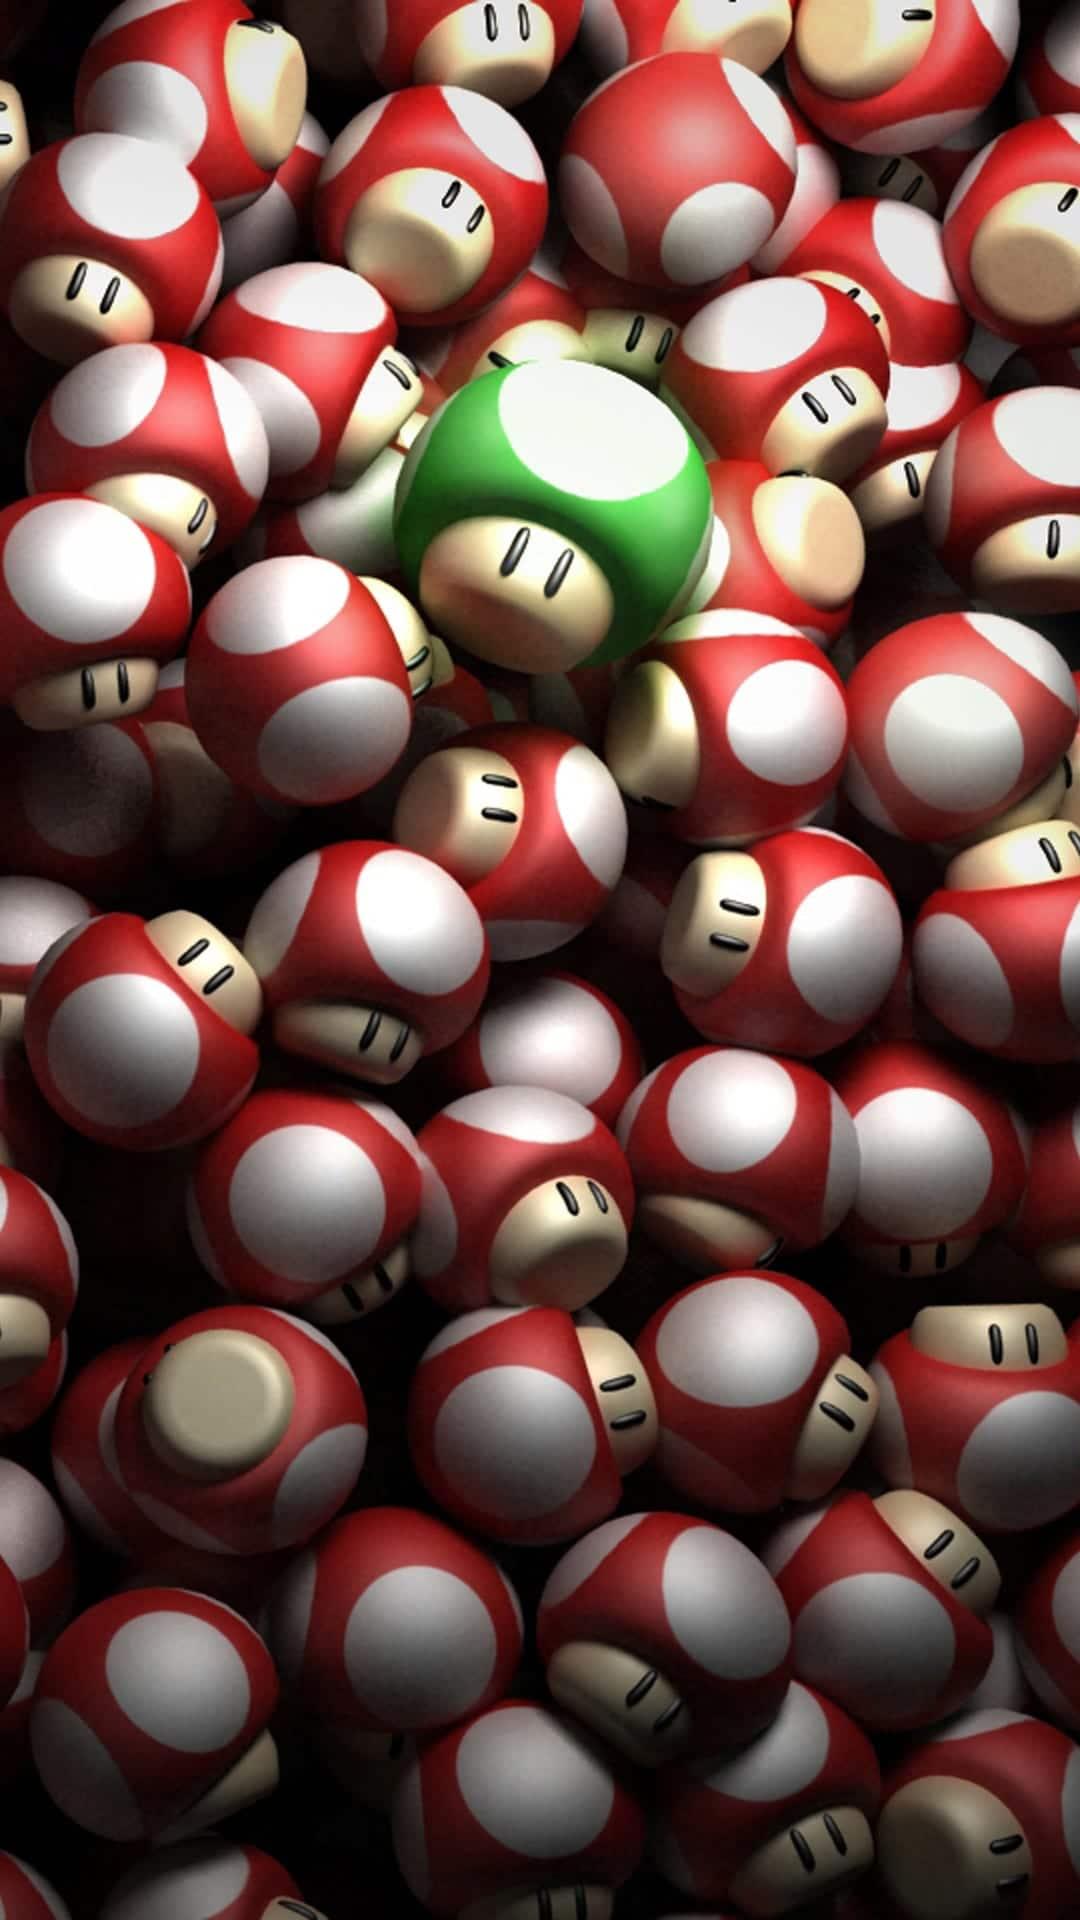 Fondos De Pantalla De Super Mario